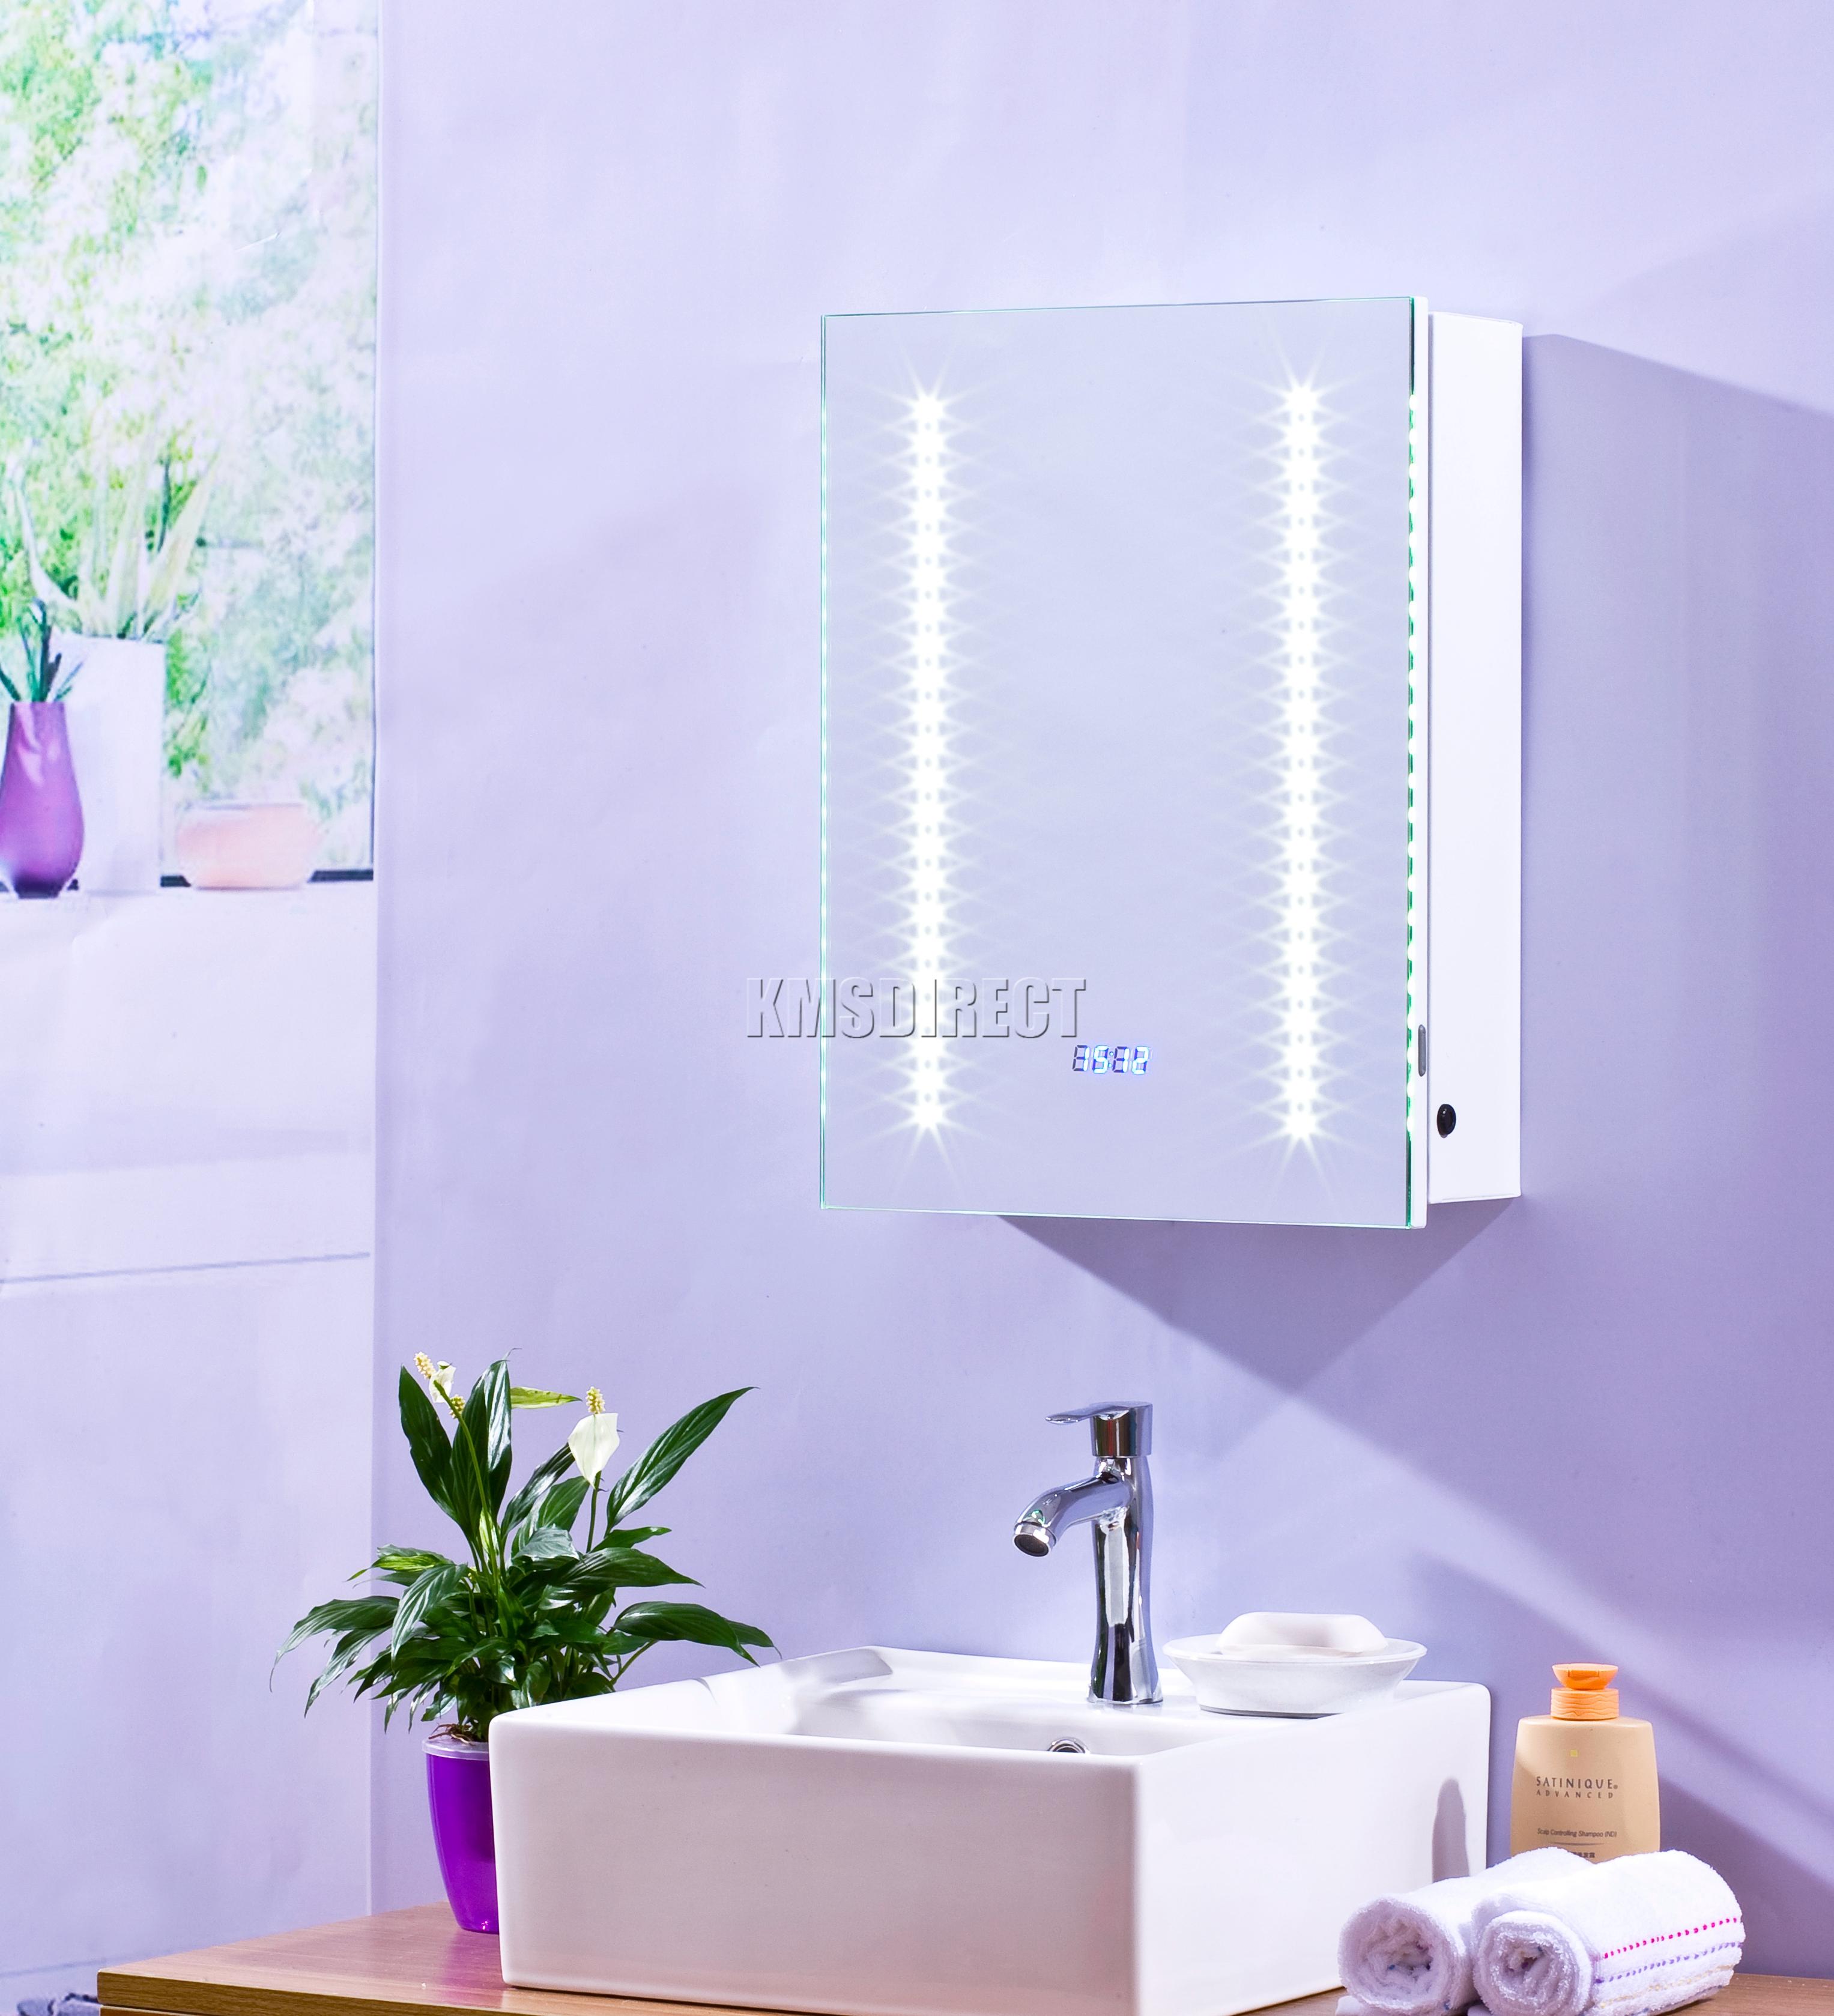 Foxhunter 1 puerta iluminado con luces led espejo gabinete for Gabinete de almacenamiento de bano barato